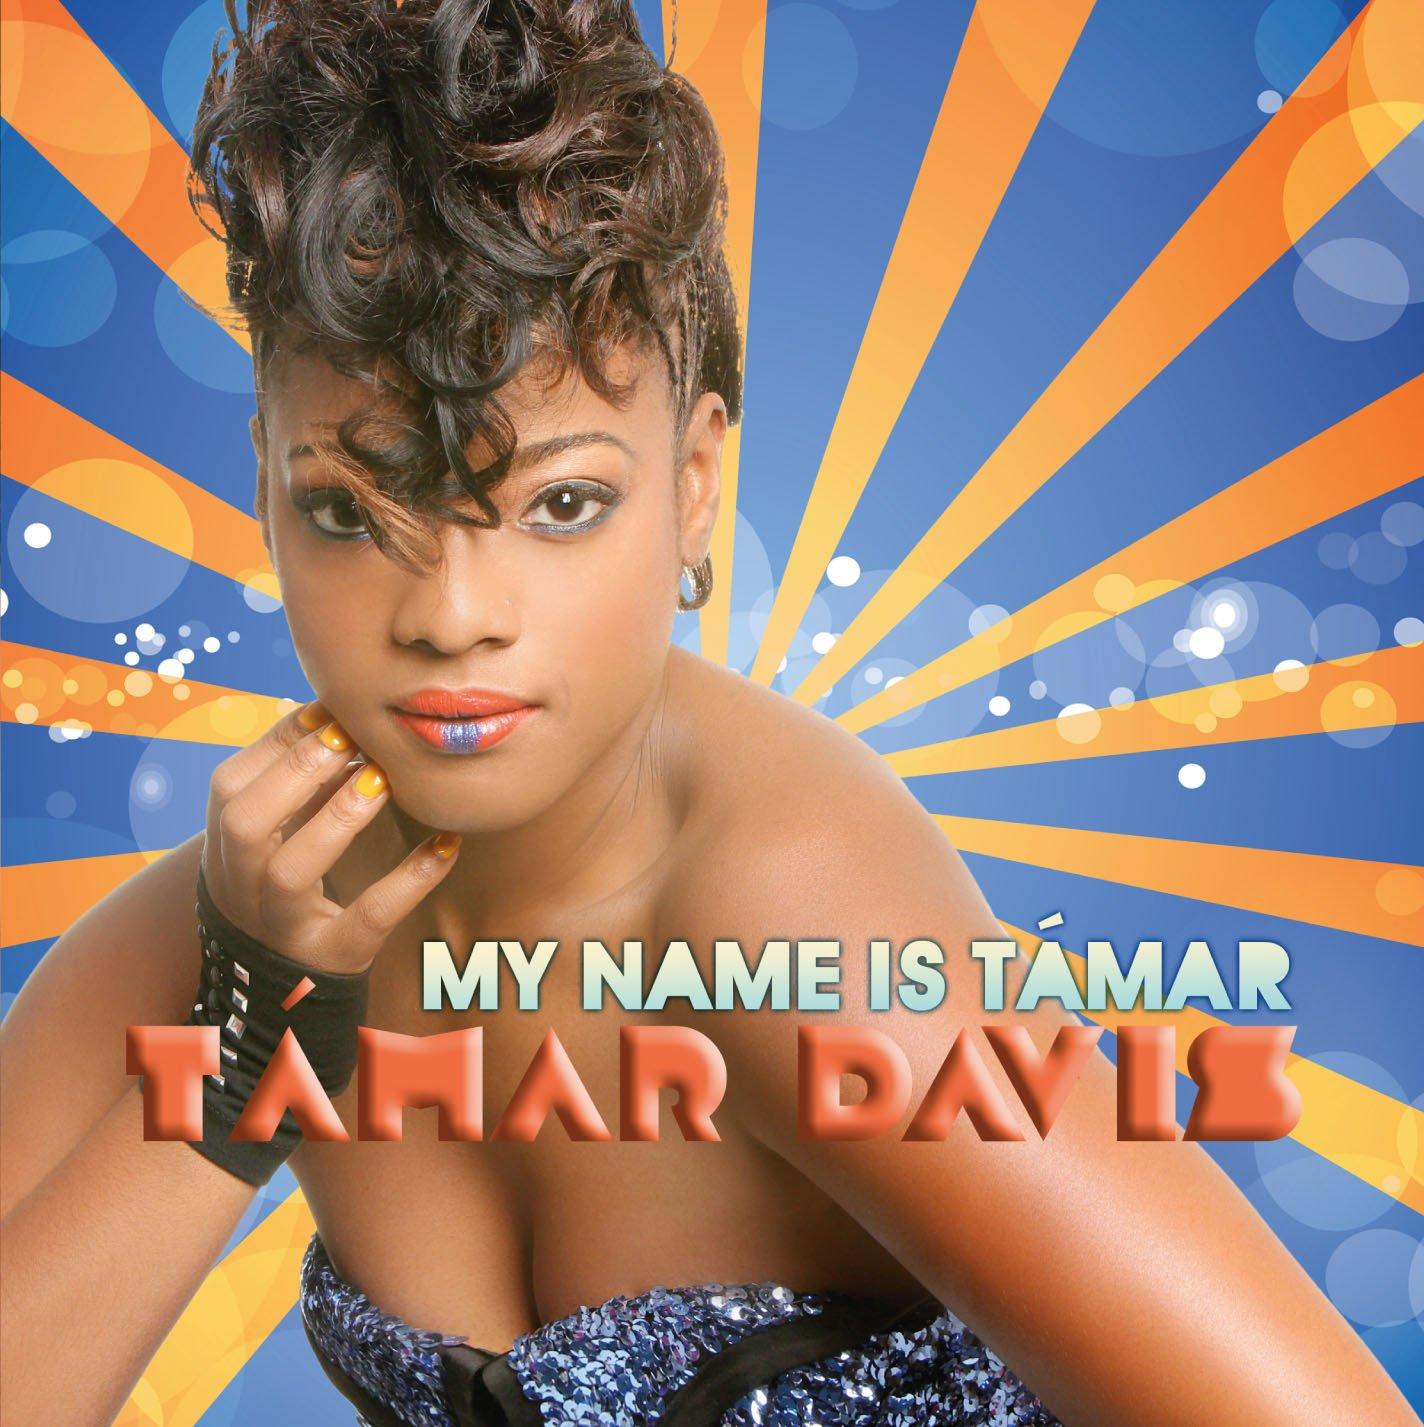 Tamar Davis 2013